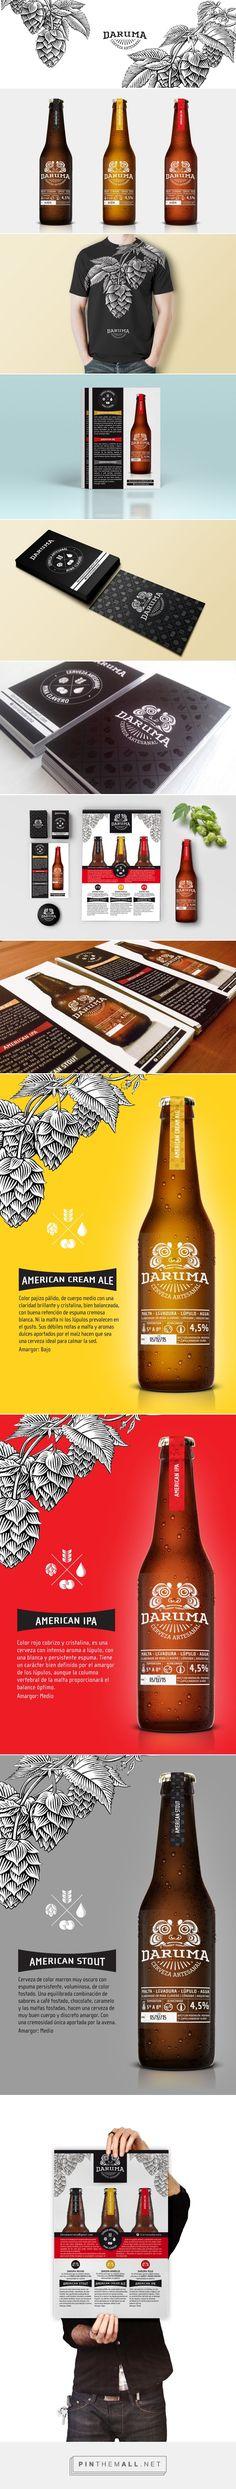 Daruma | Cerveza Artesanal by Virginia Scardino